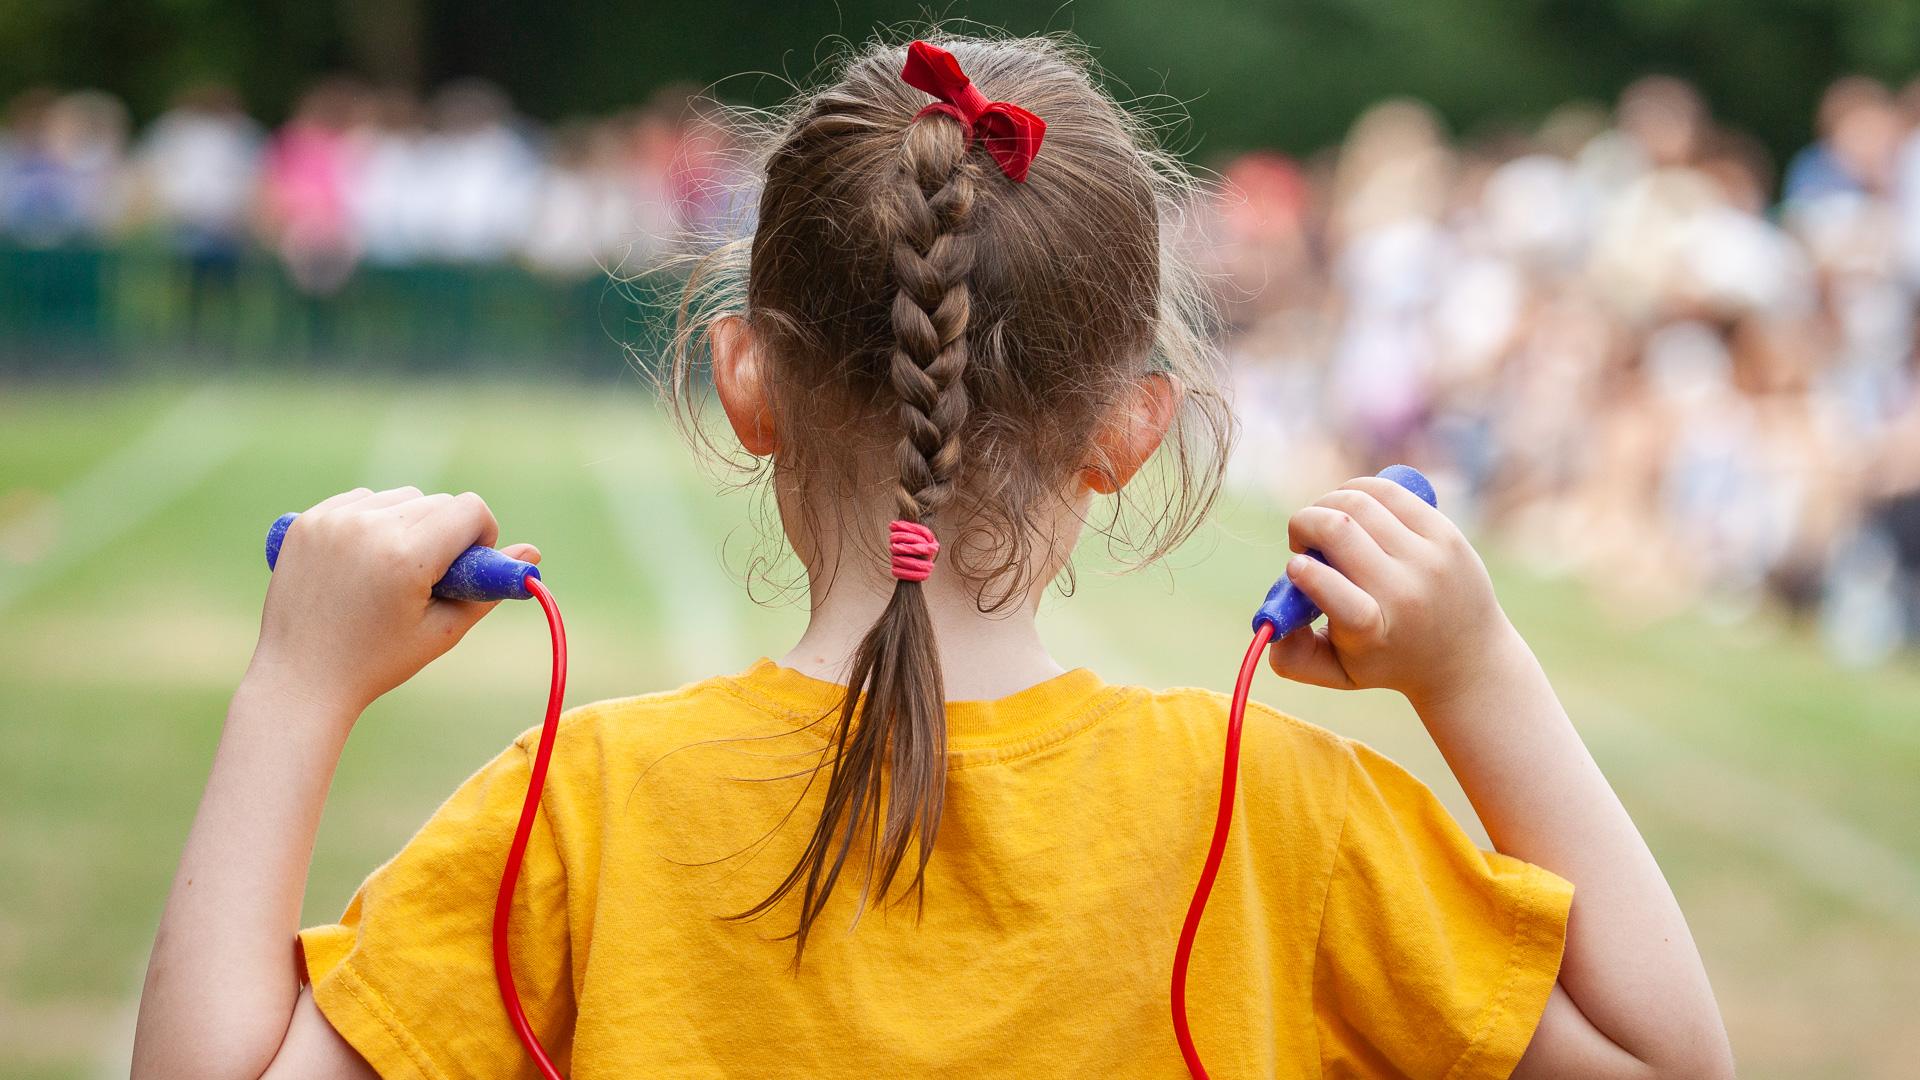 Child taking part in school sports day.